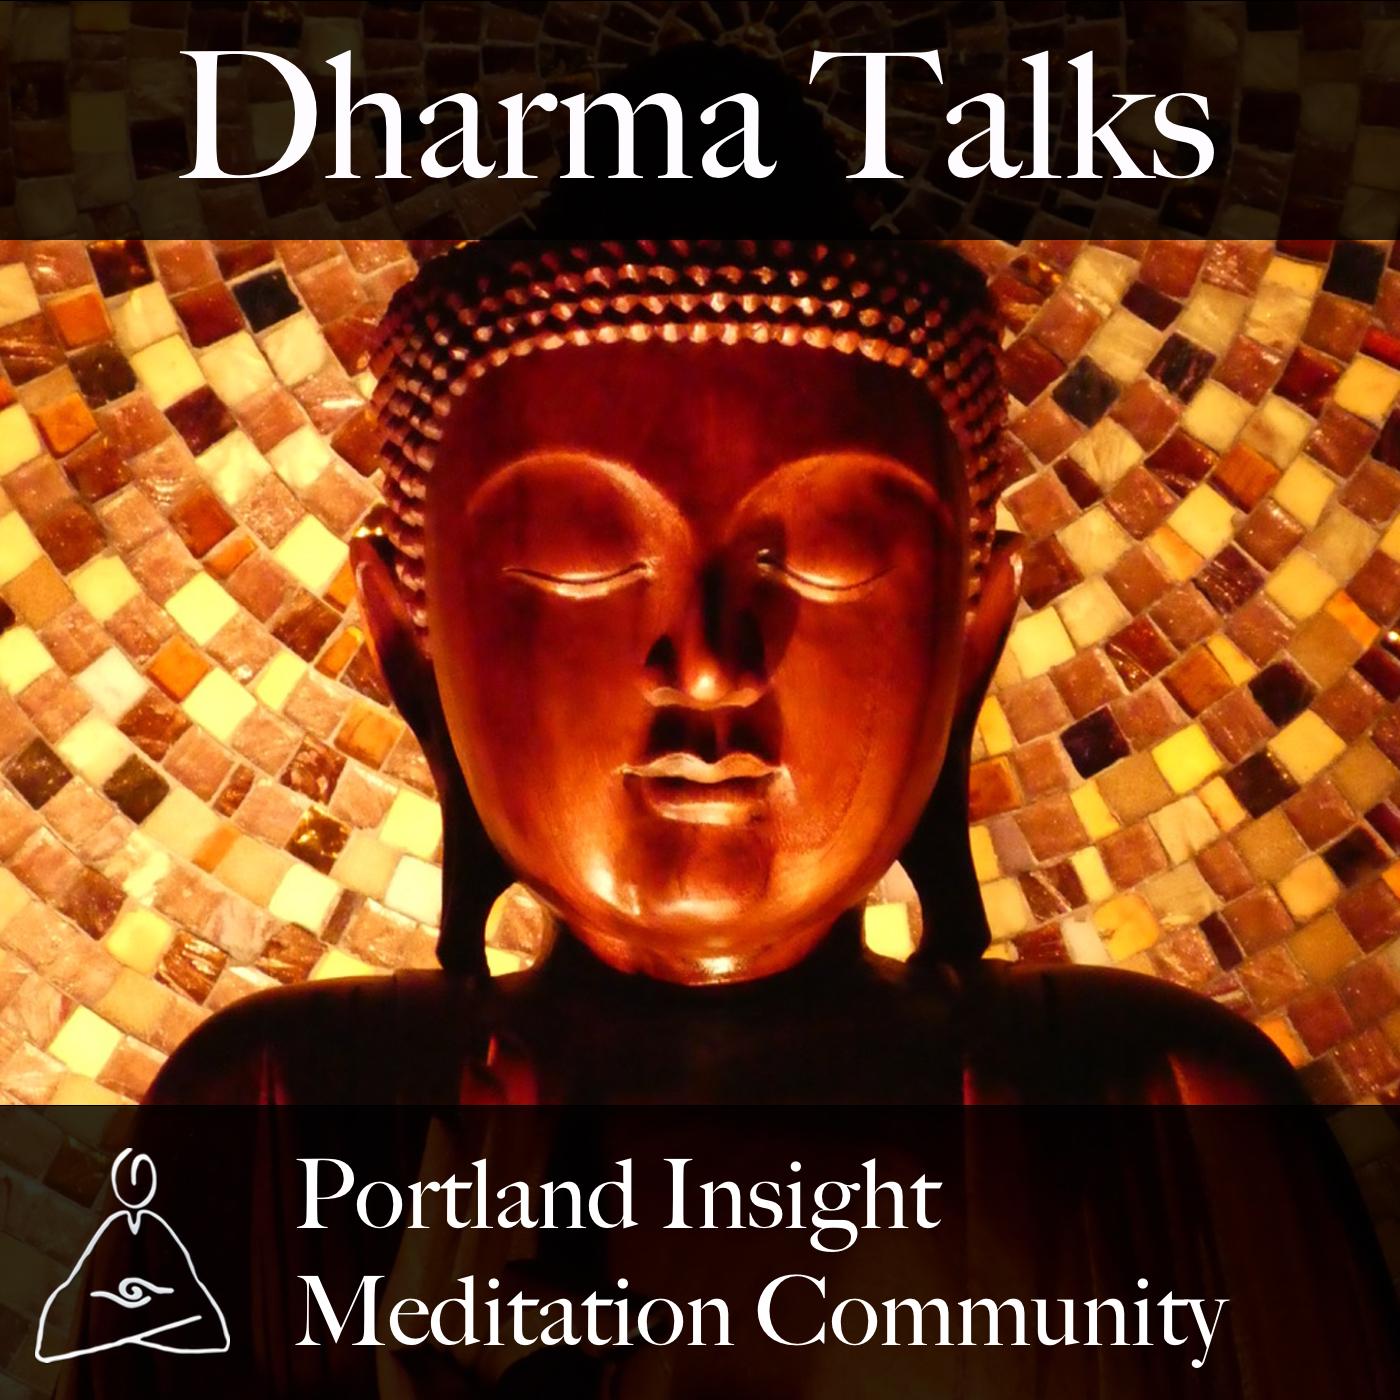 Portland Insight Meditation Community Dharma Talks show art